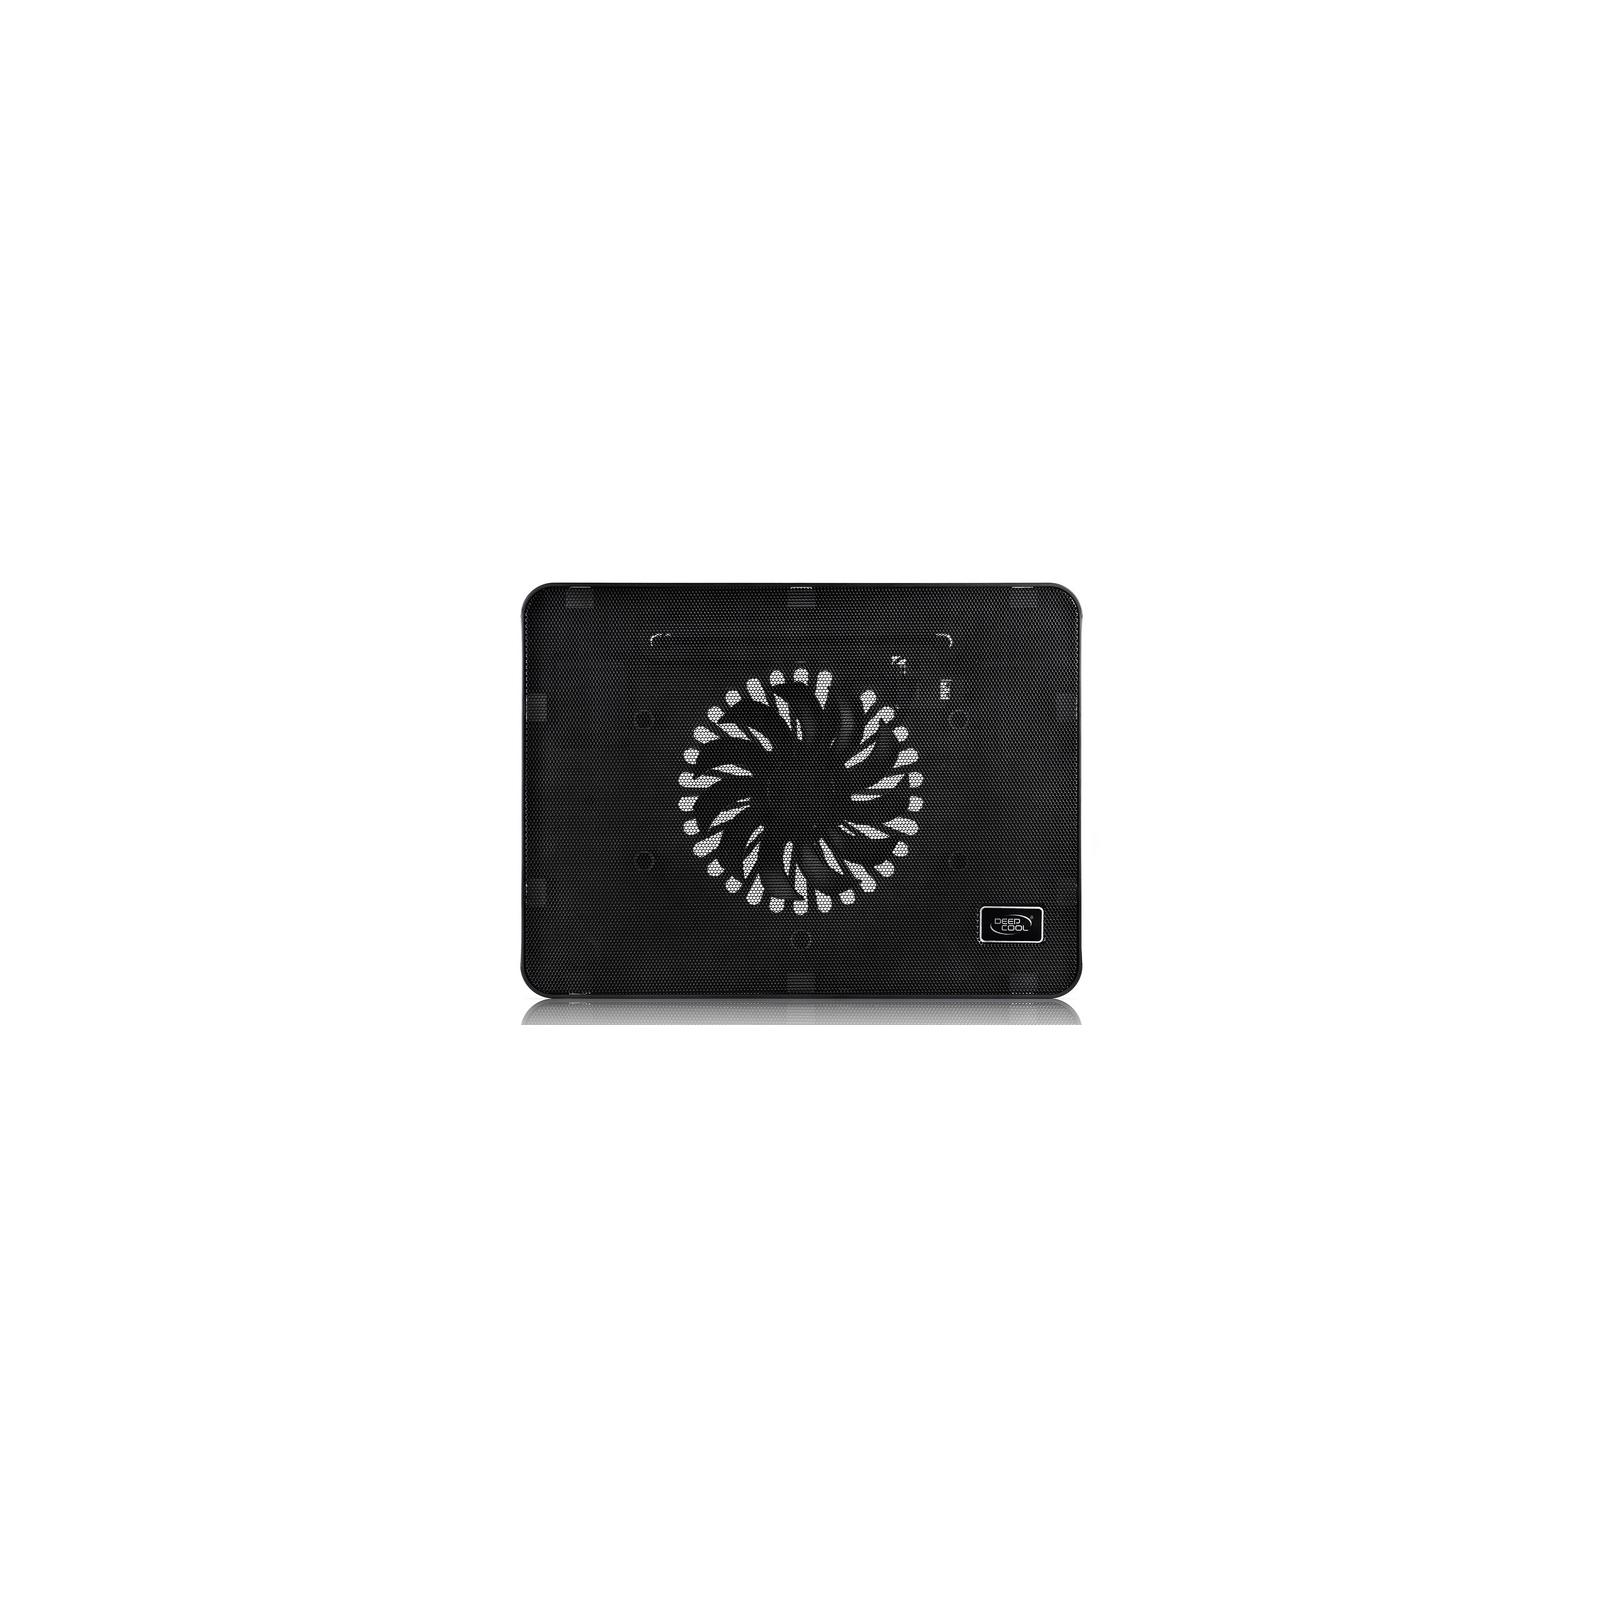 Подставка для ноутбука Deepcool WIND PAL MINI изображение 3